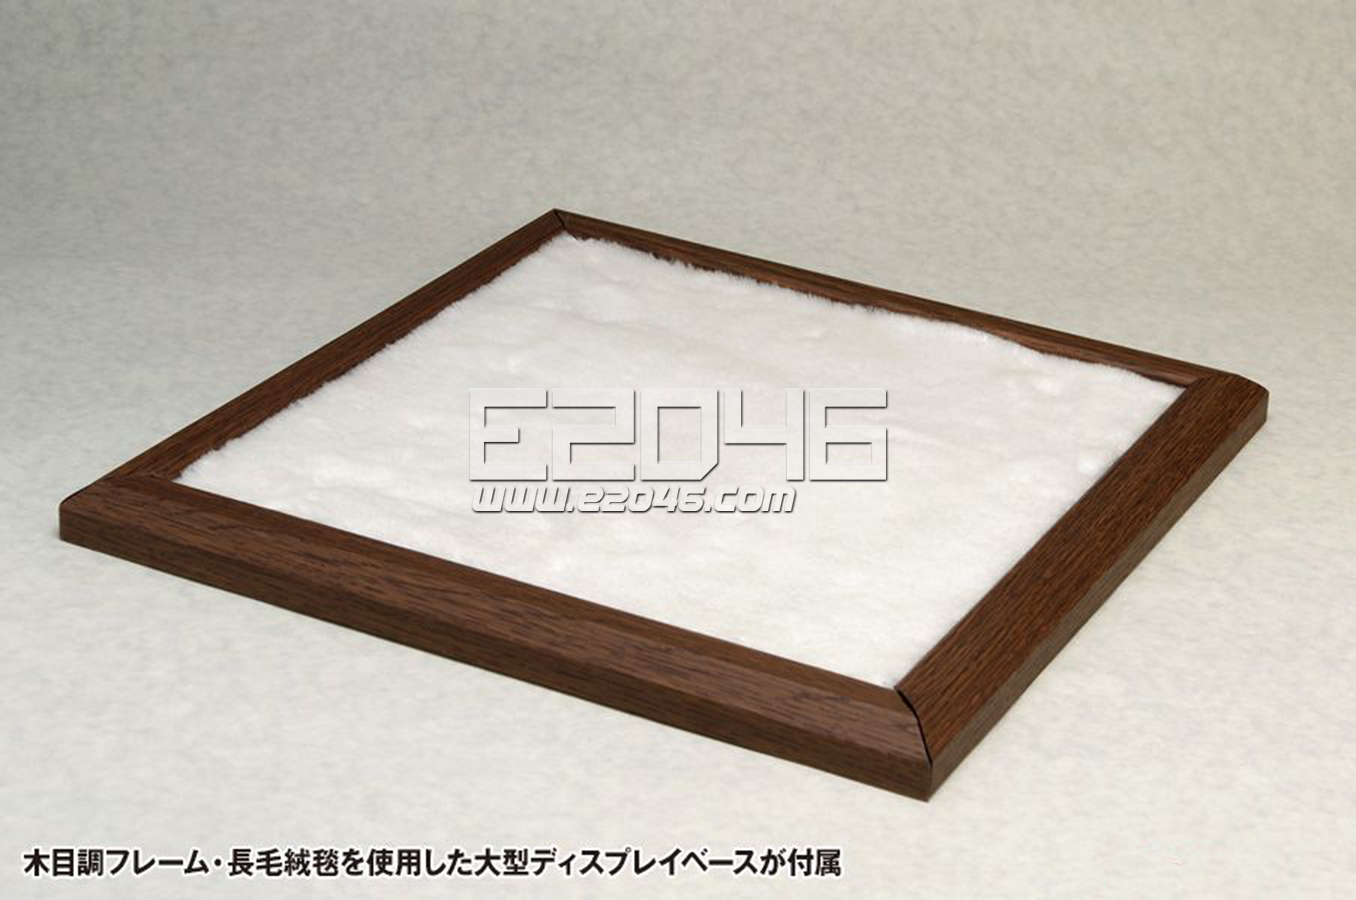 Fate/stay night One-piece Style Premium Set (PVC)